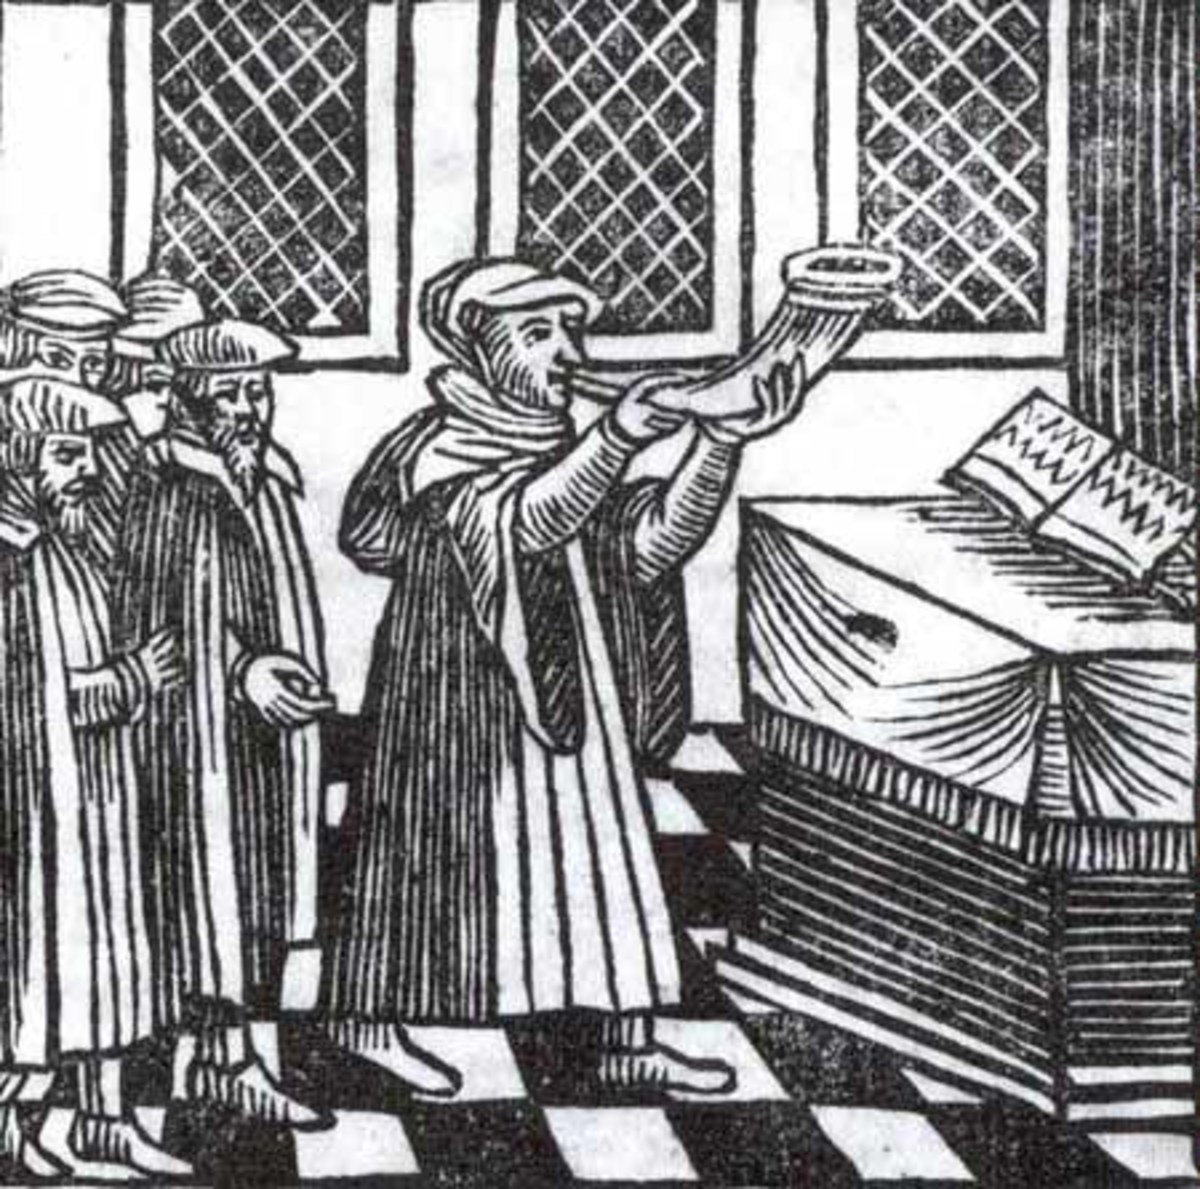 Blowing the Shofar on Rosh Hashanah in  Amsterdam, Passover Haggadah, 1695.